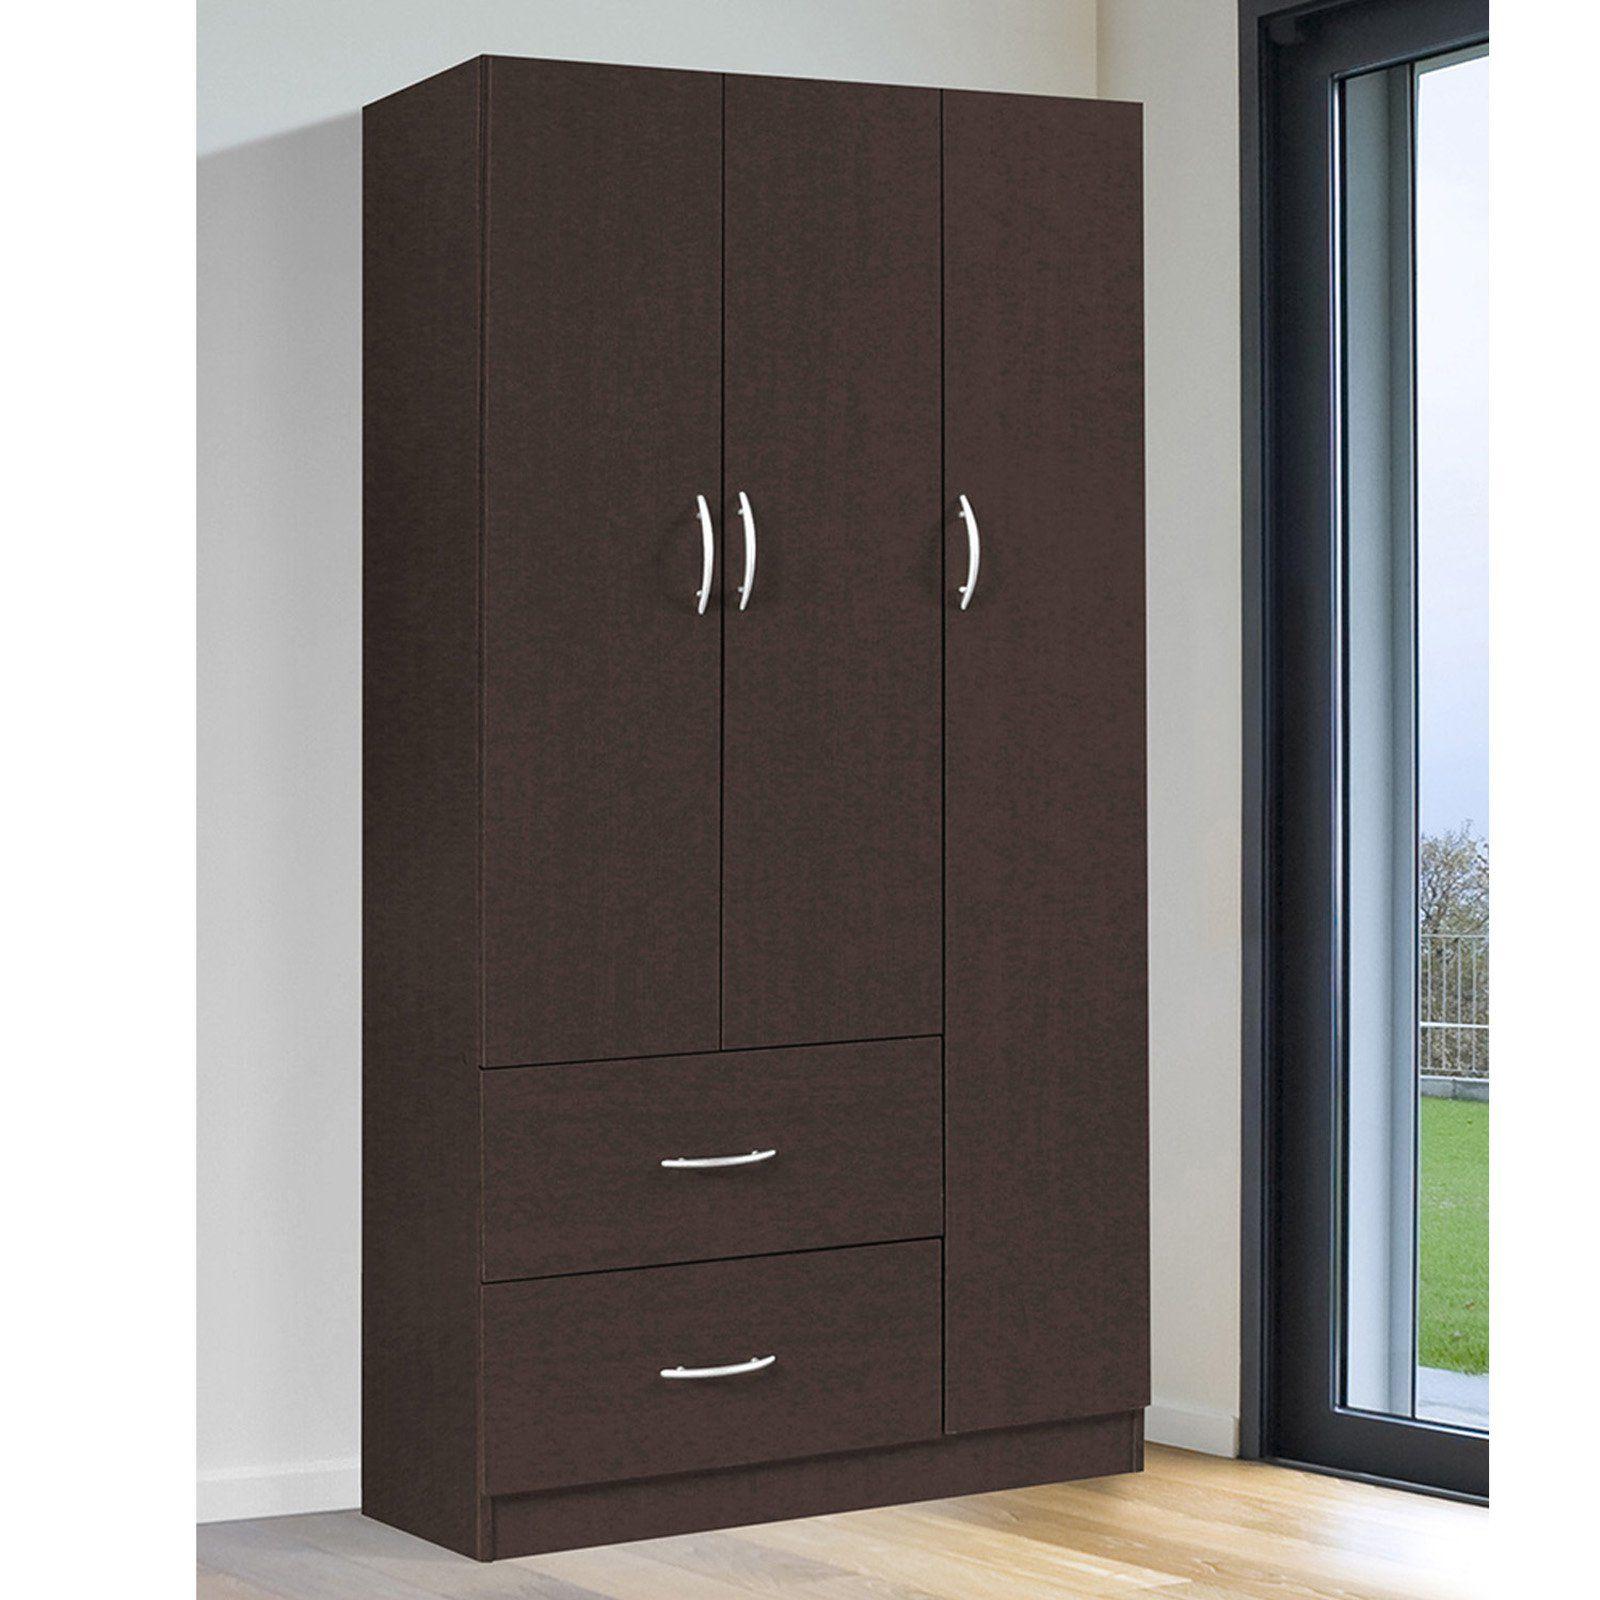 Home Source Industries Shauna 3 Door Wardrobe   RLN3201H ESPRESSO